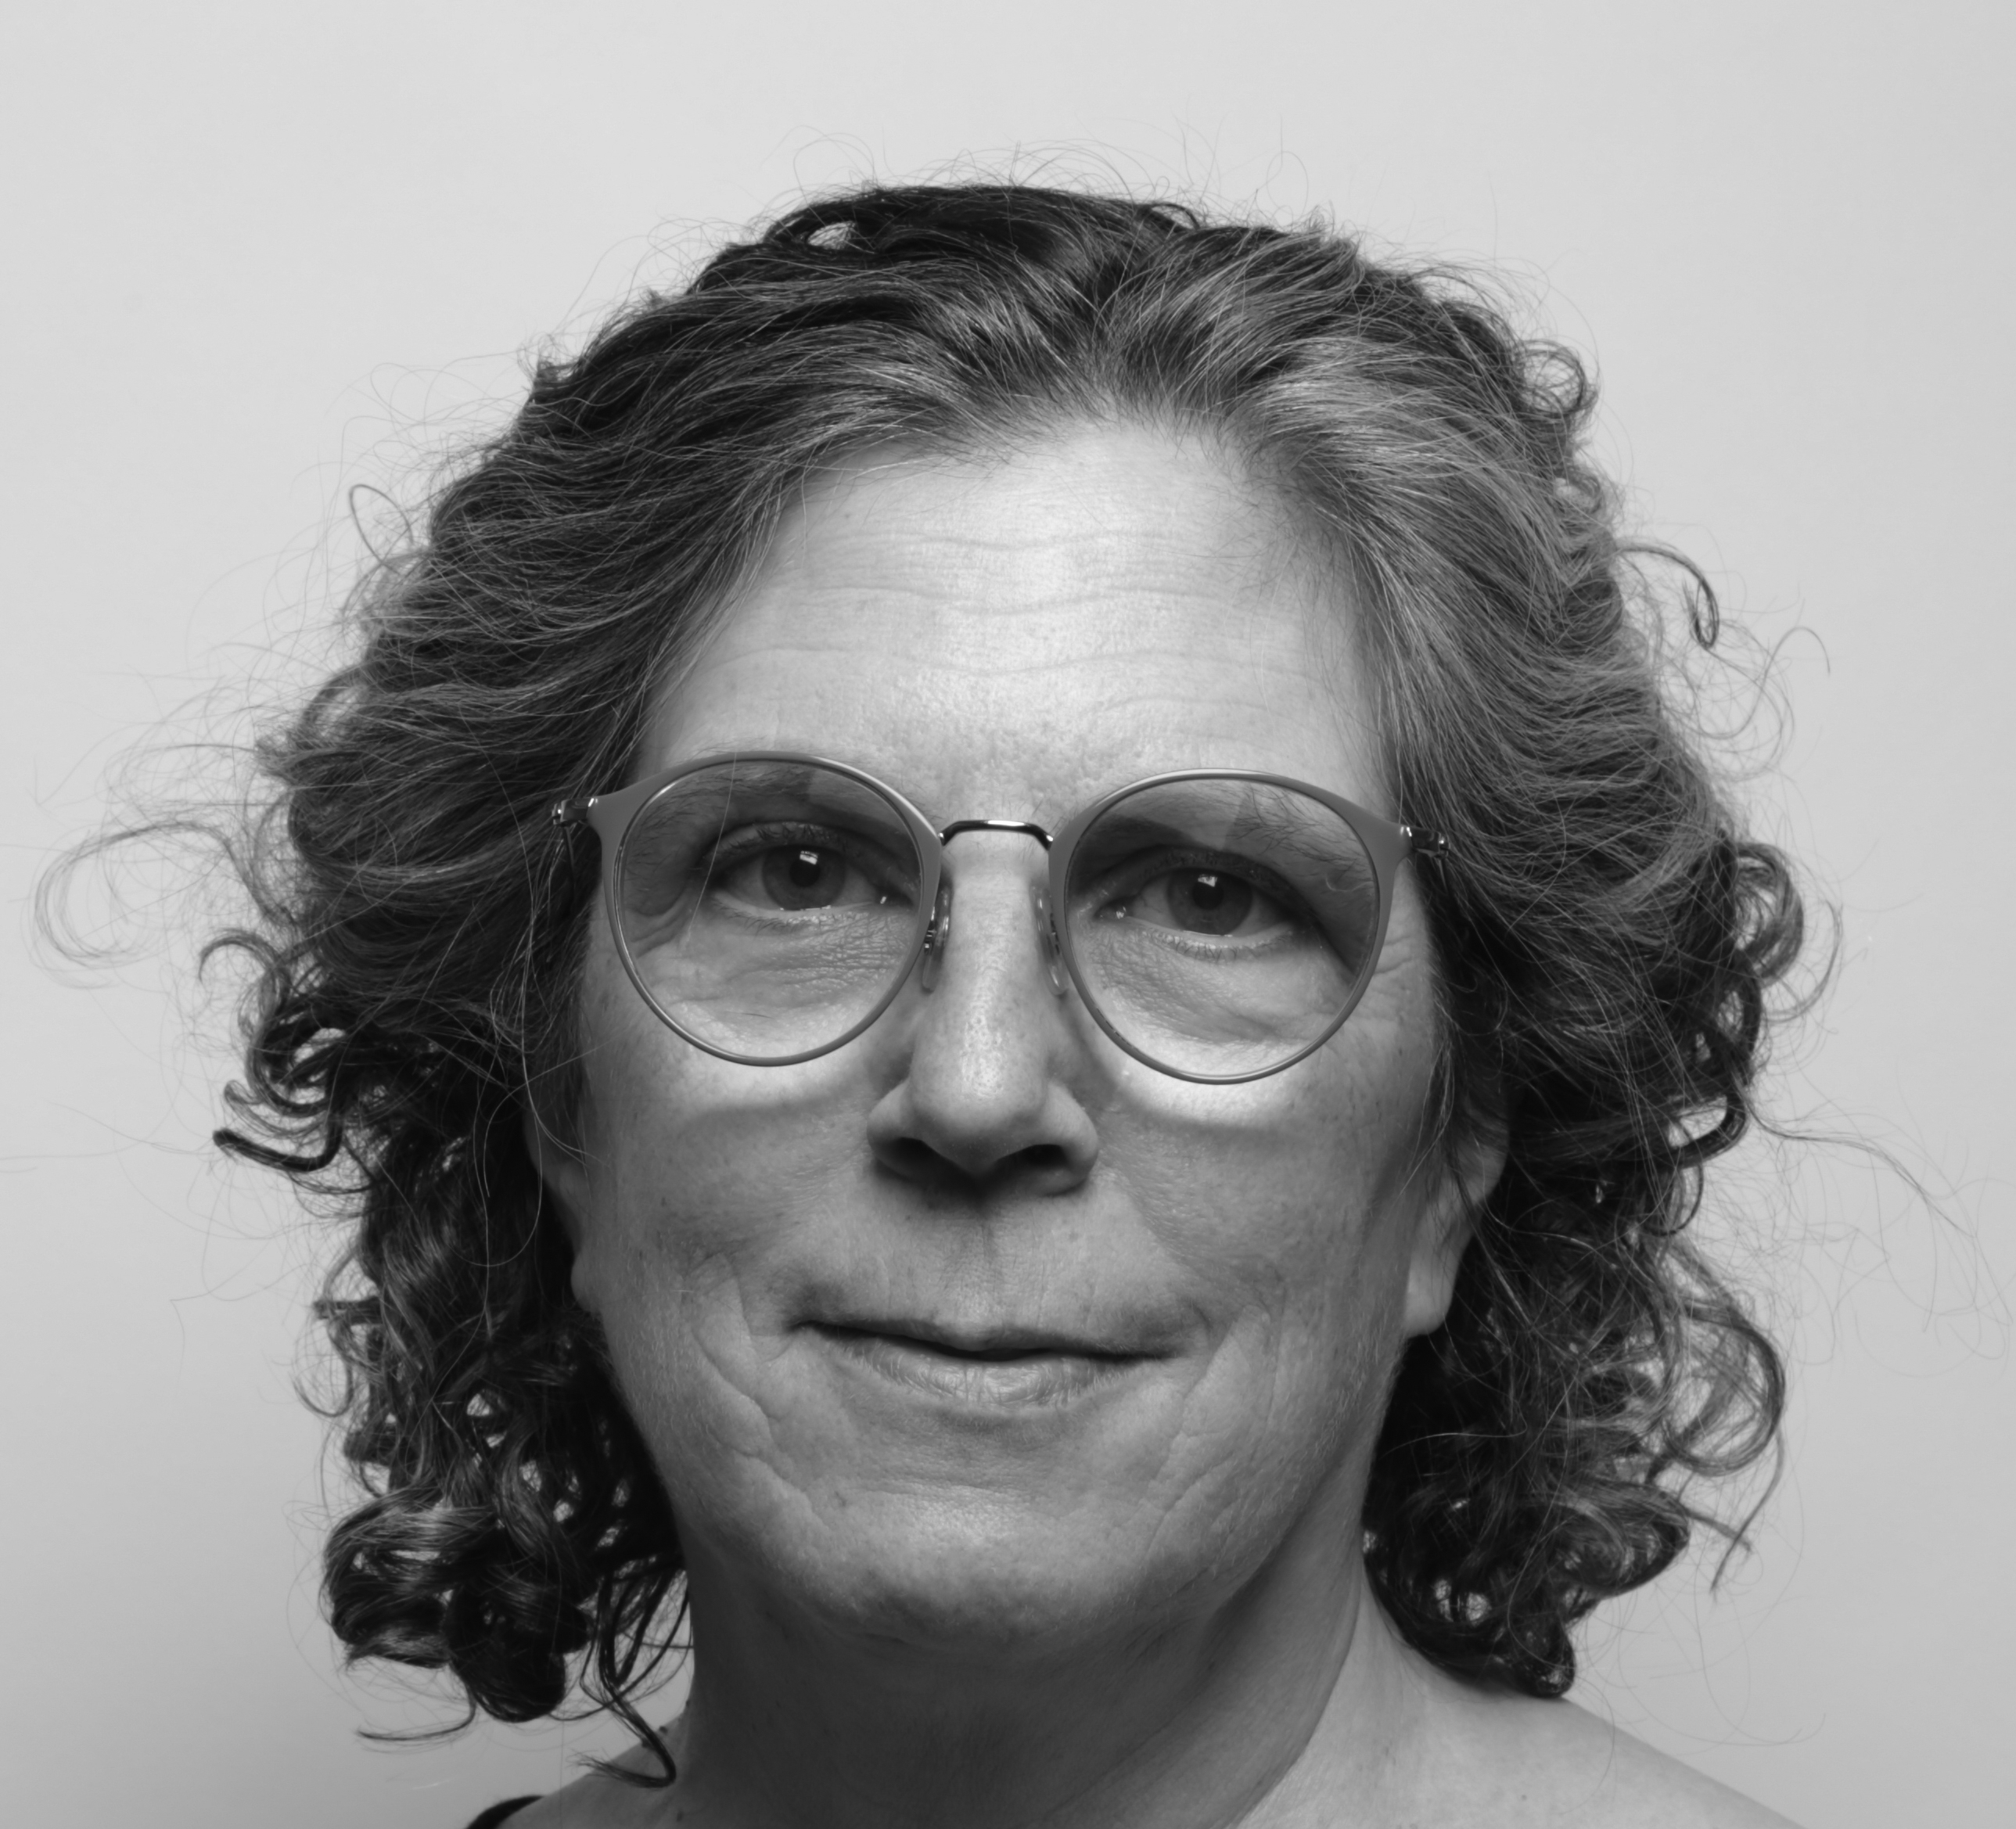 Rachel Weiss portrait